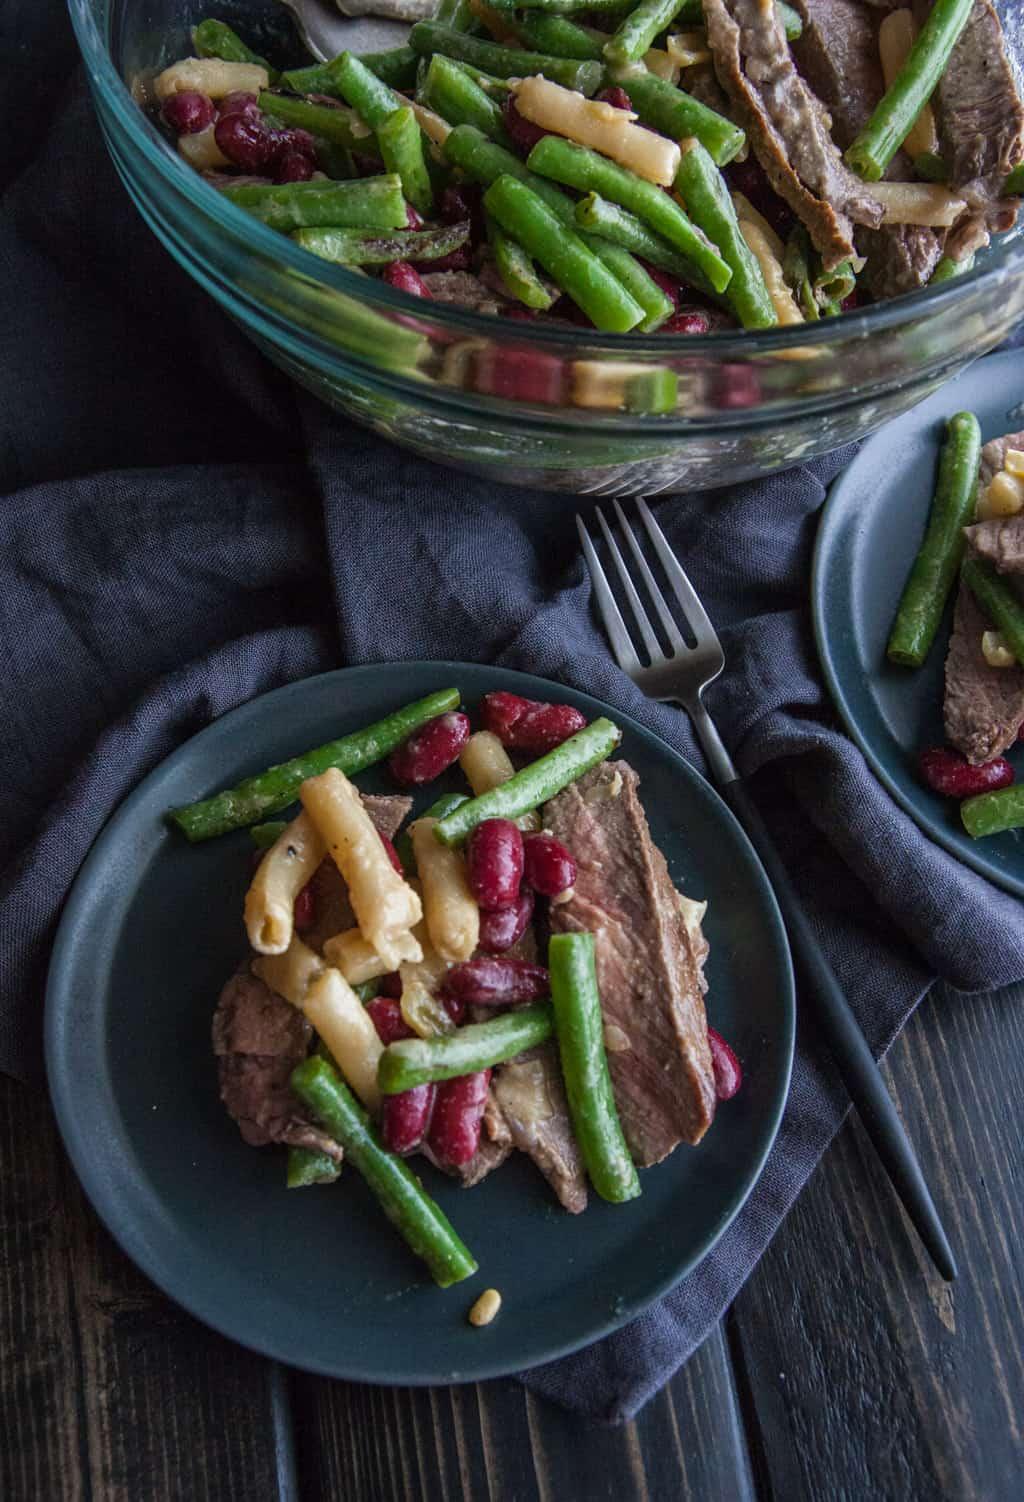 Three bean and steak salad recipe from @sweetphi